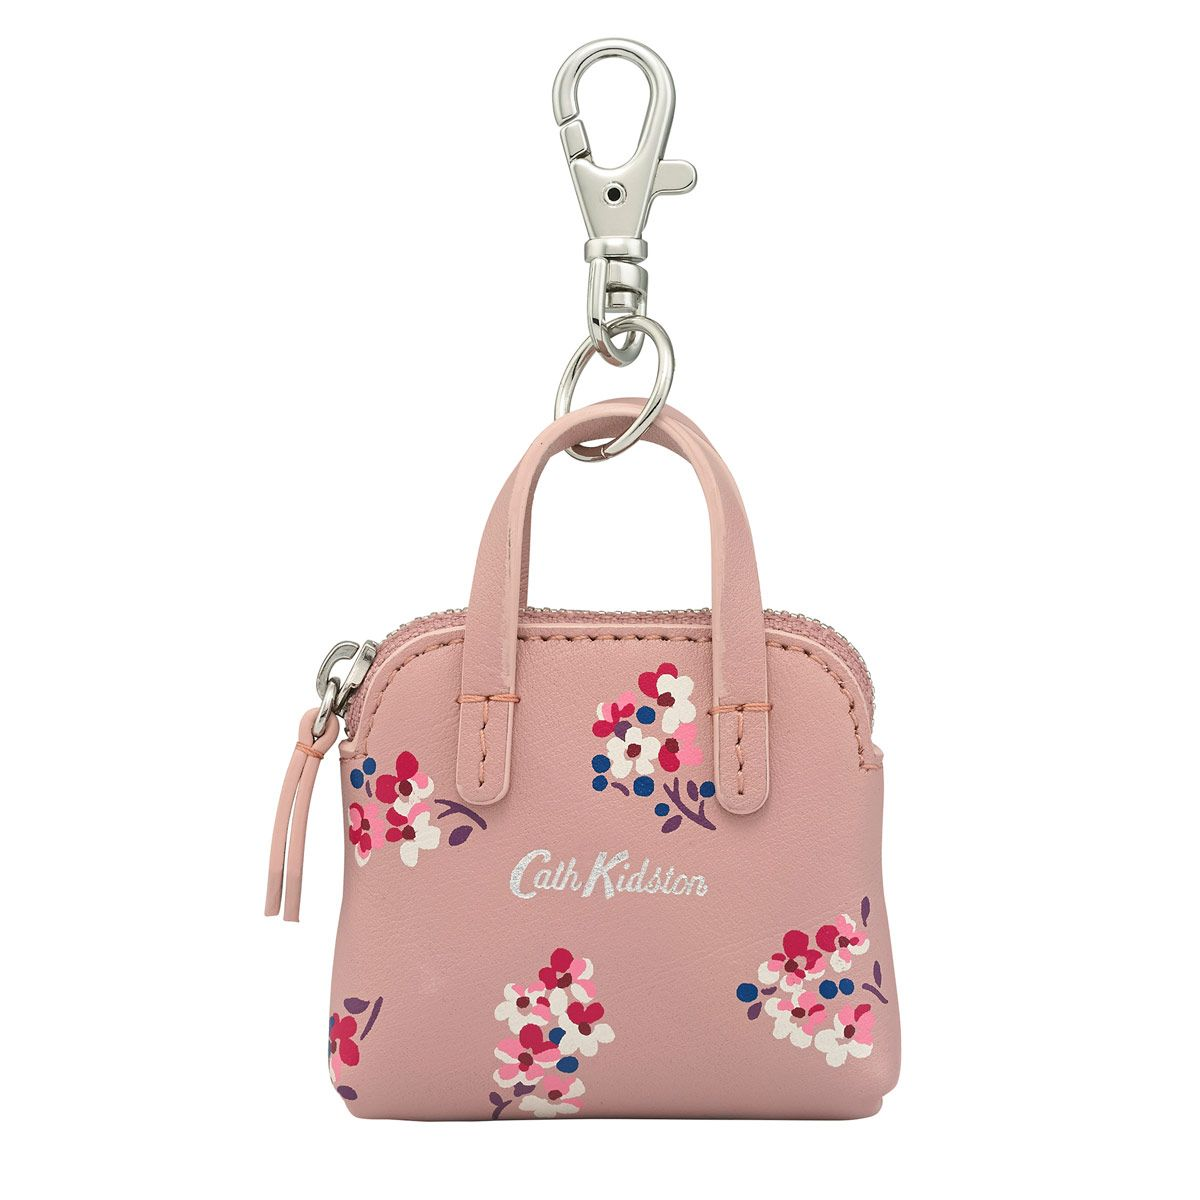 ddad997b832177 Woodstock Ditsy Giles Mini Leather Handbag Keyring | Keyrings & Bag Charms  | CathKidston